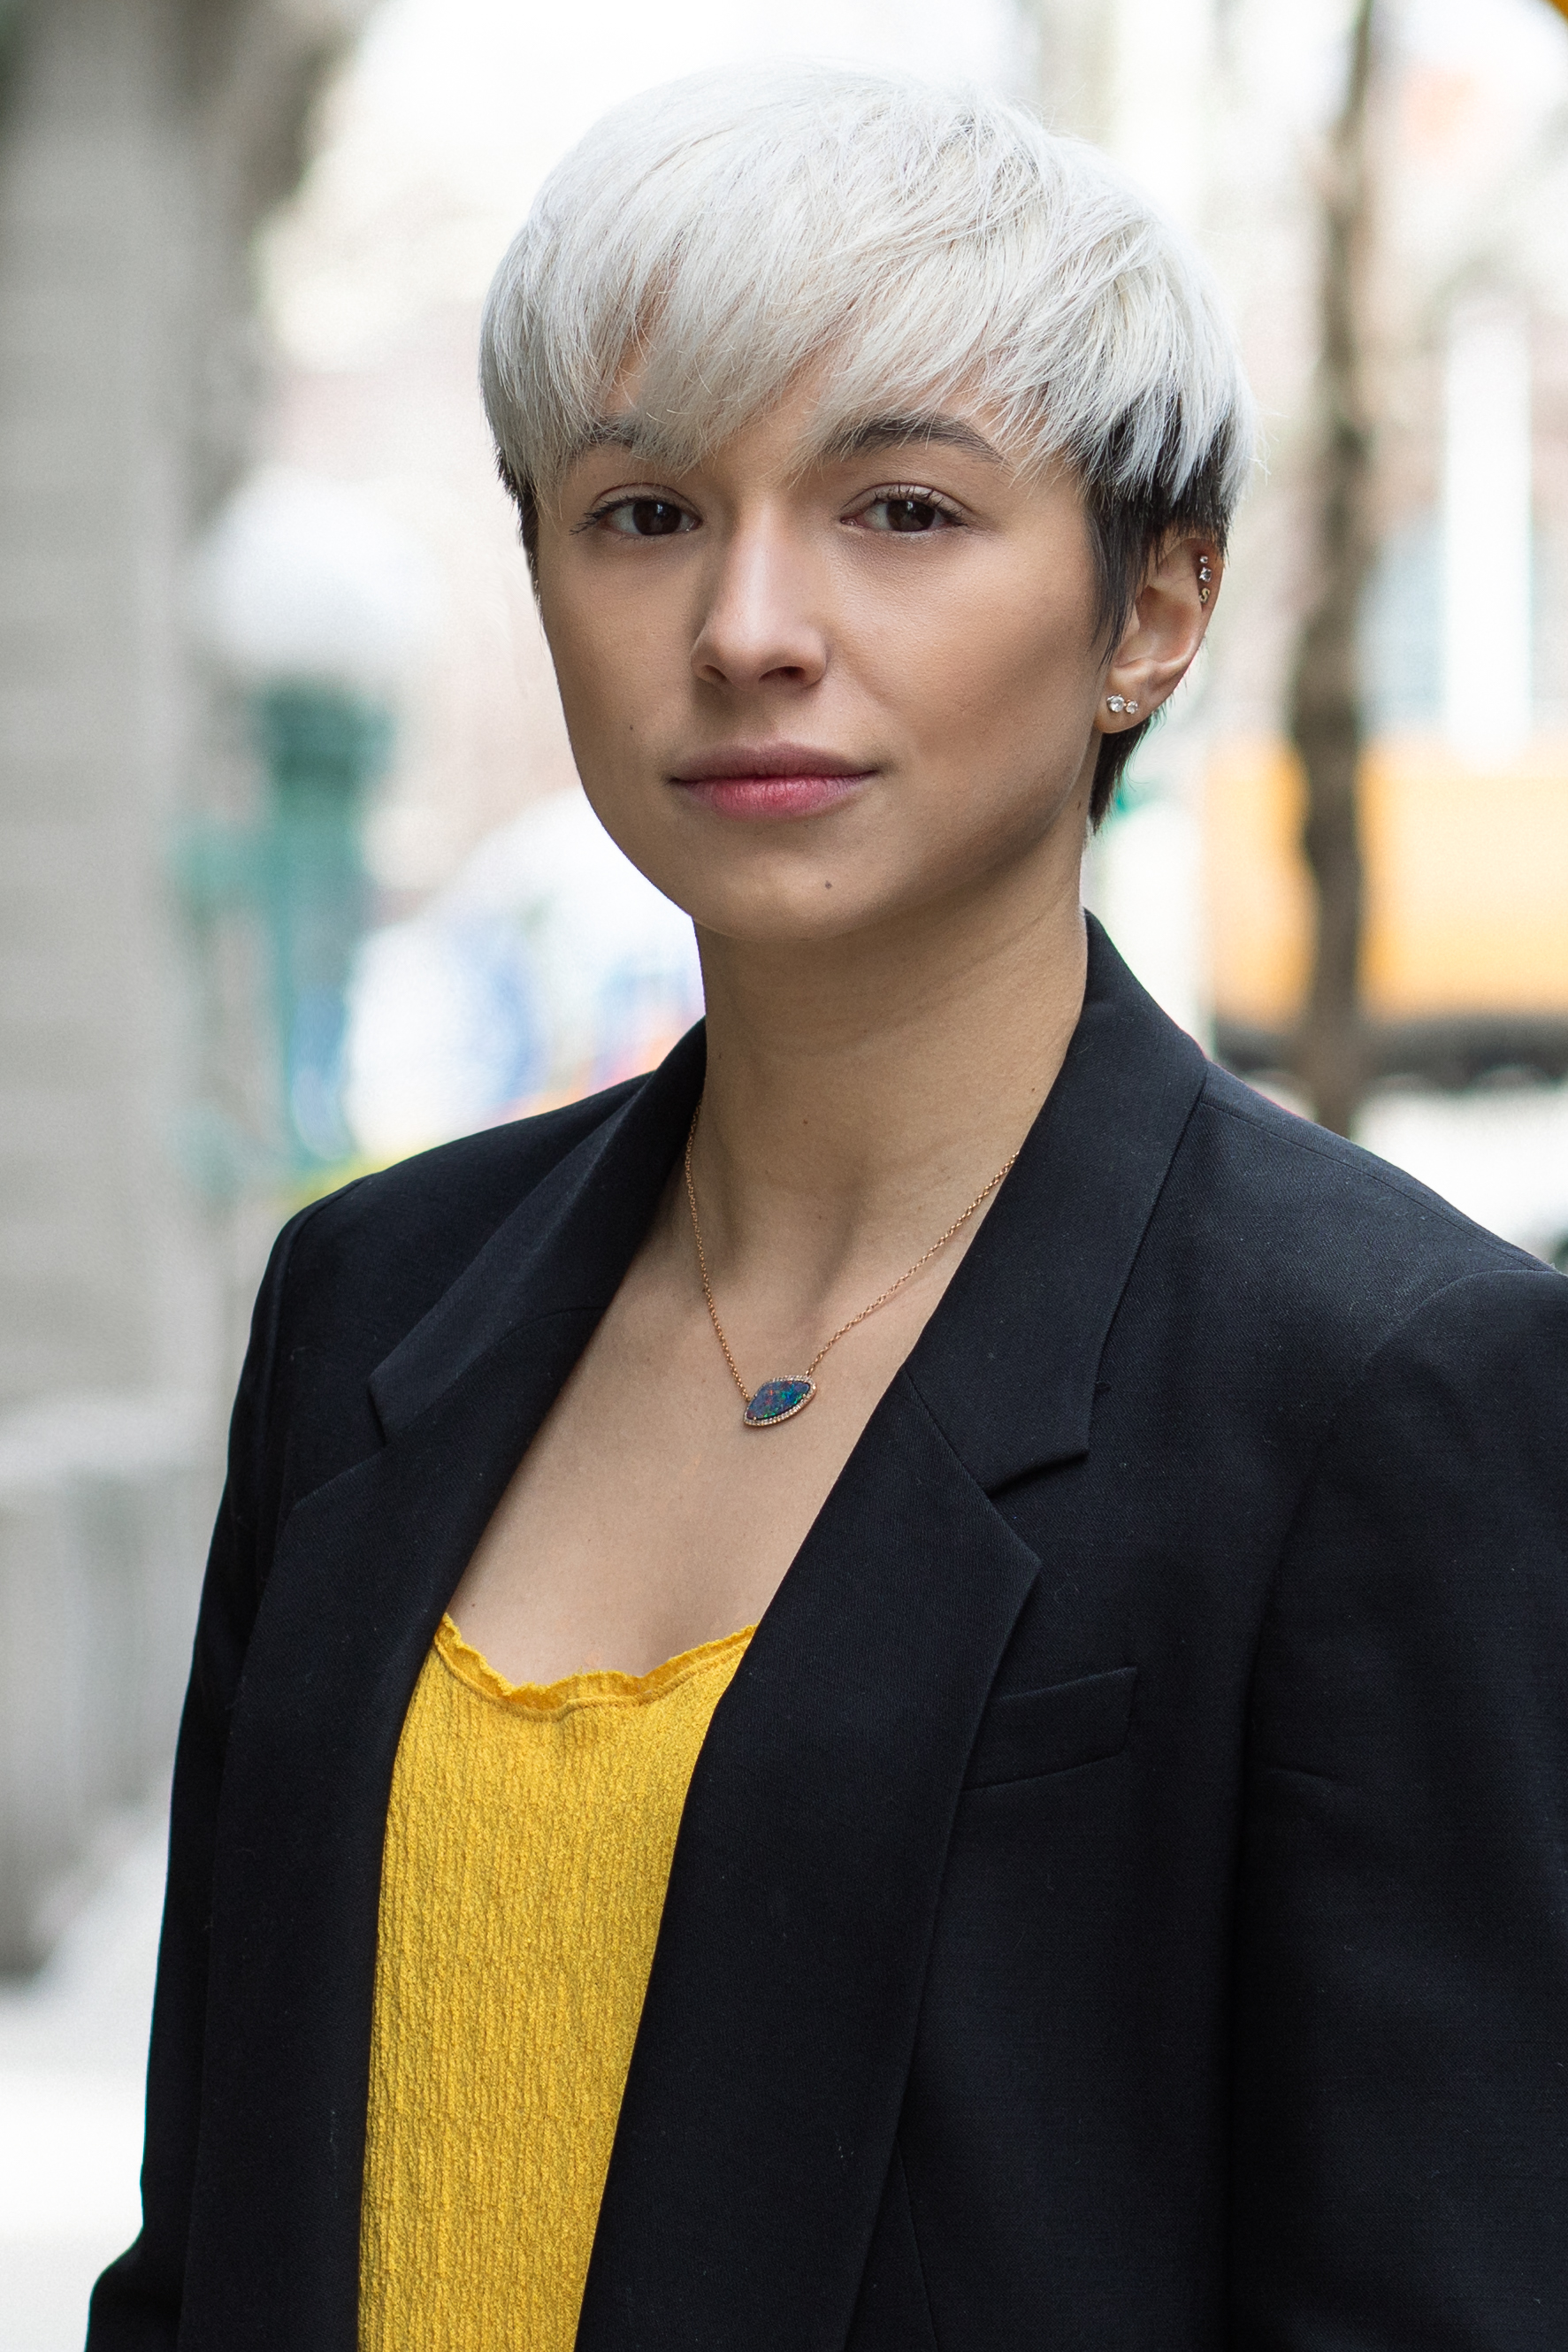 Shannon Stiggins - Operational Director, Co-founder